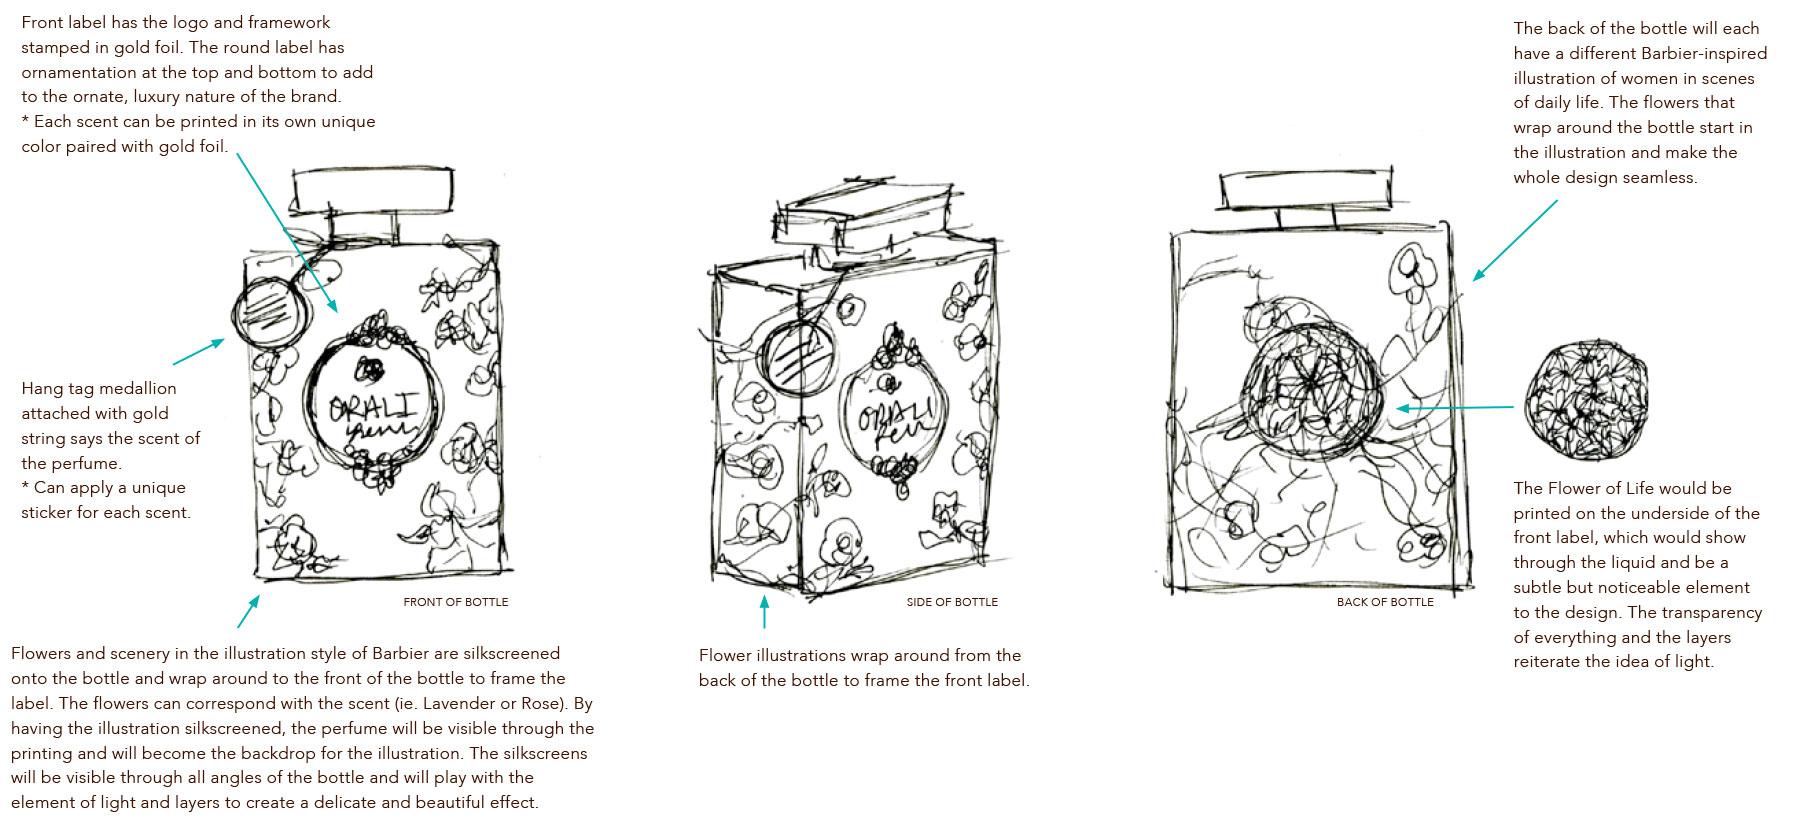 ceci_johnson_ceci_new_york_orali_perfume_custom_branding_logo_design_business_collateral_illustration_v242_05